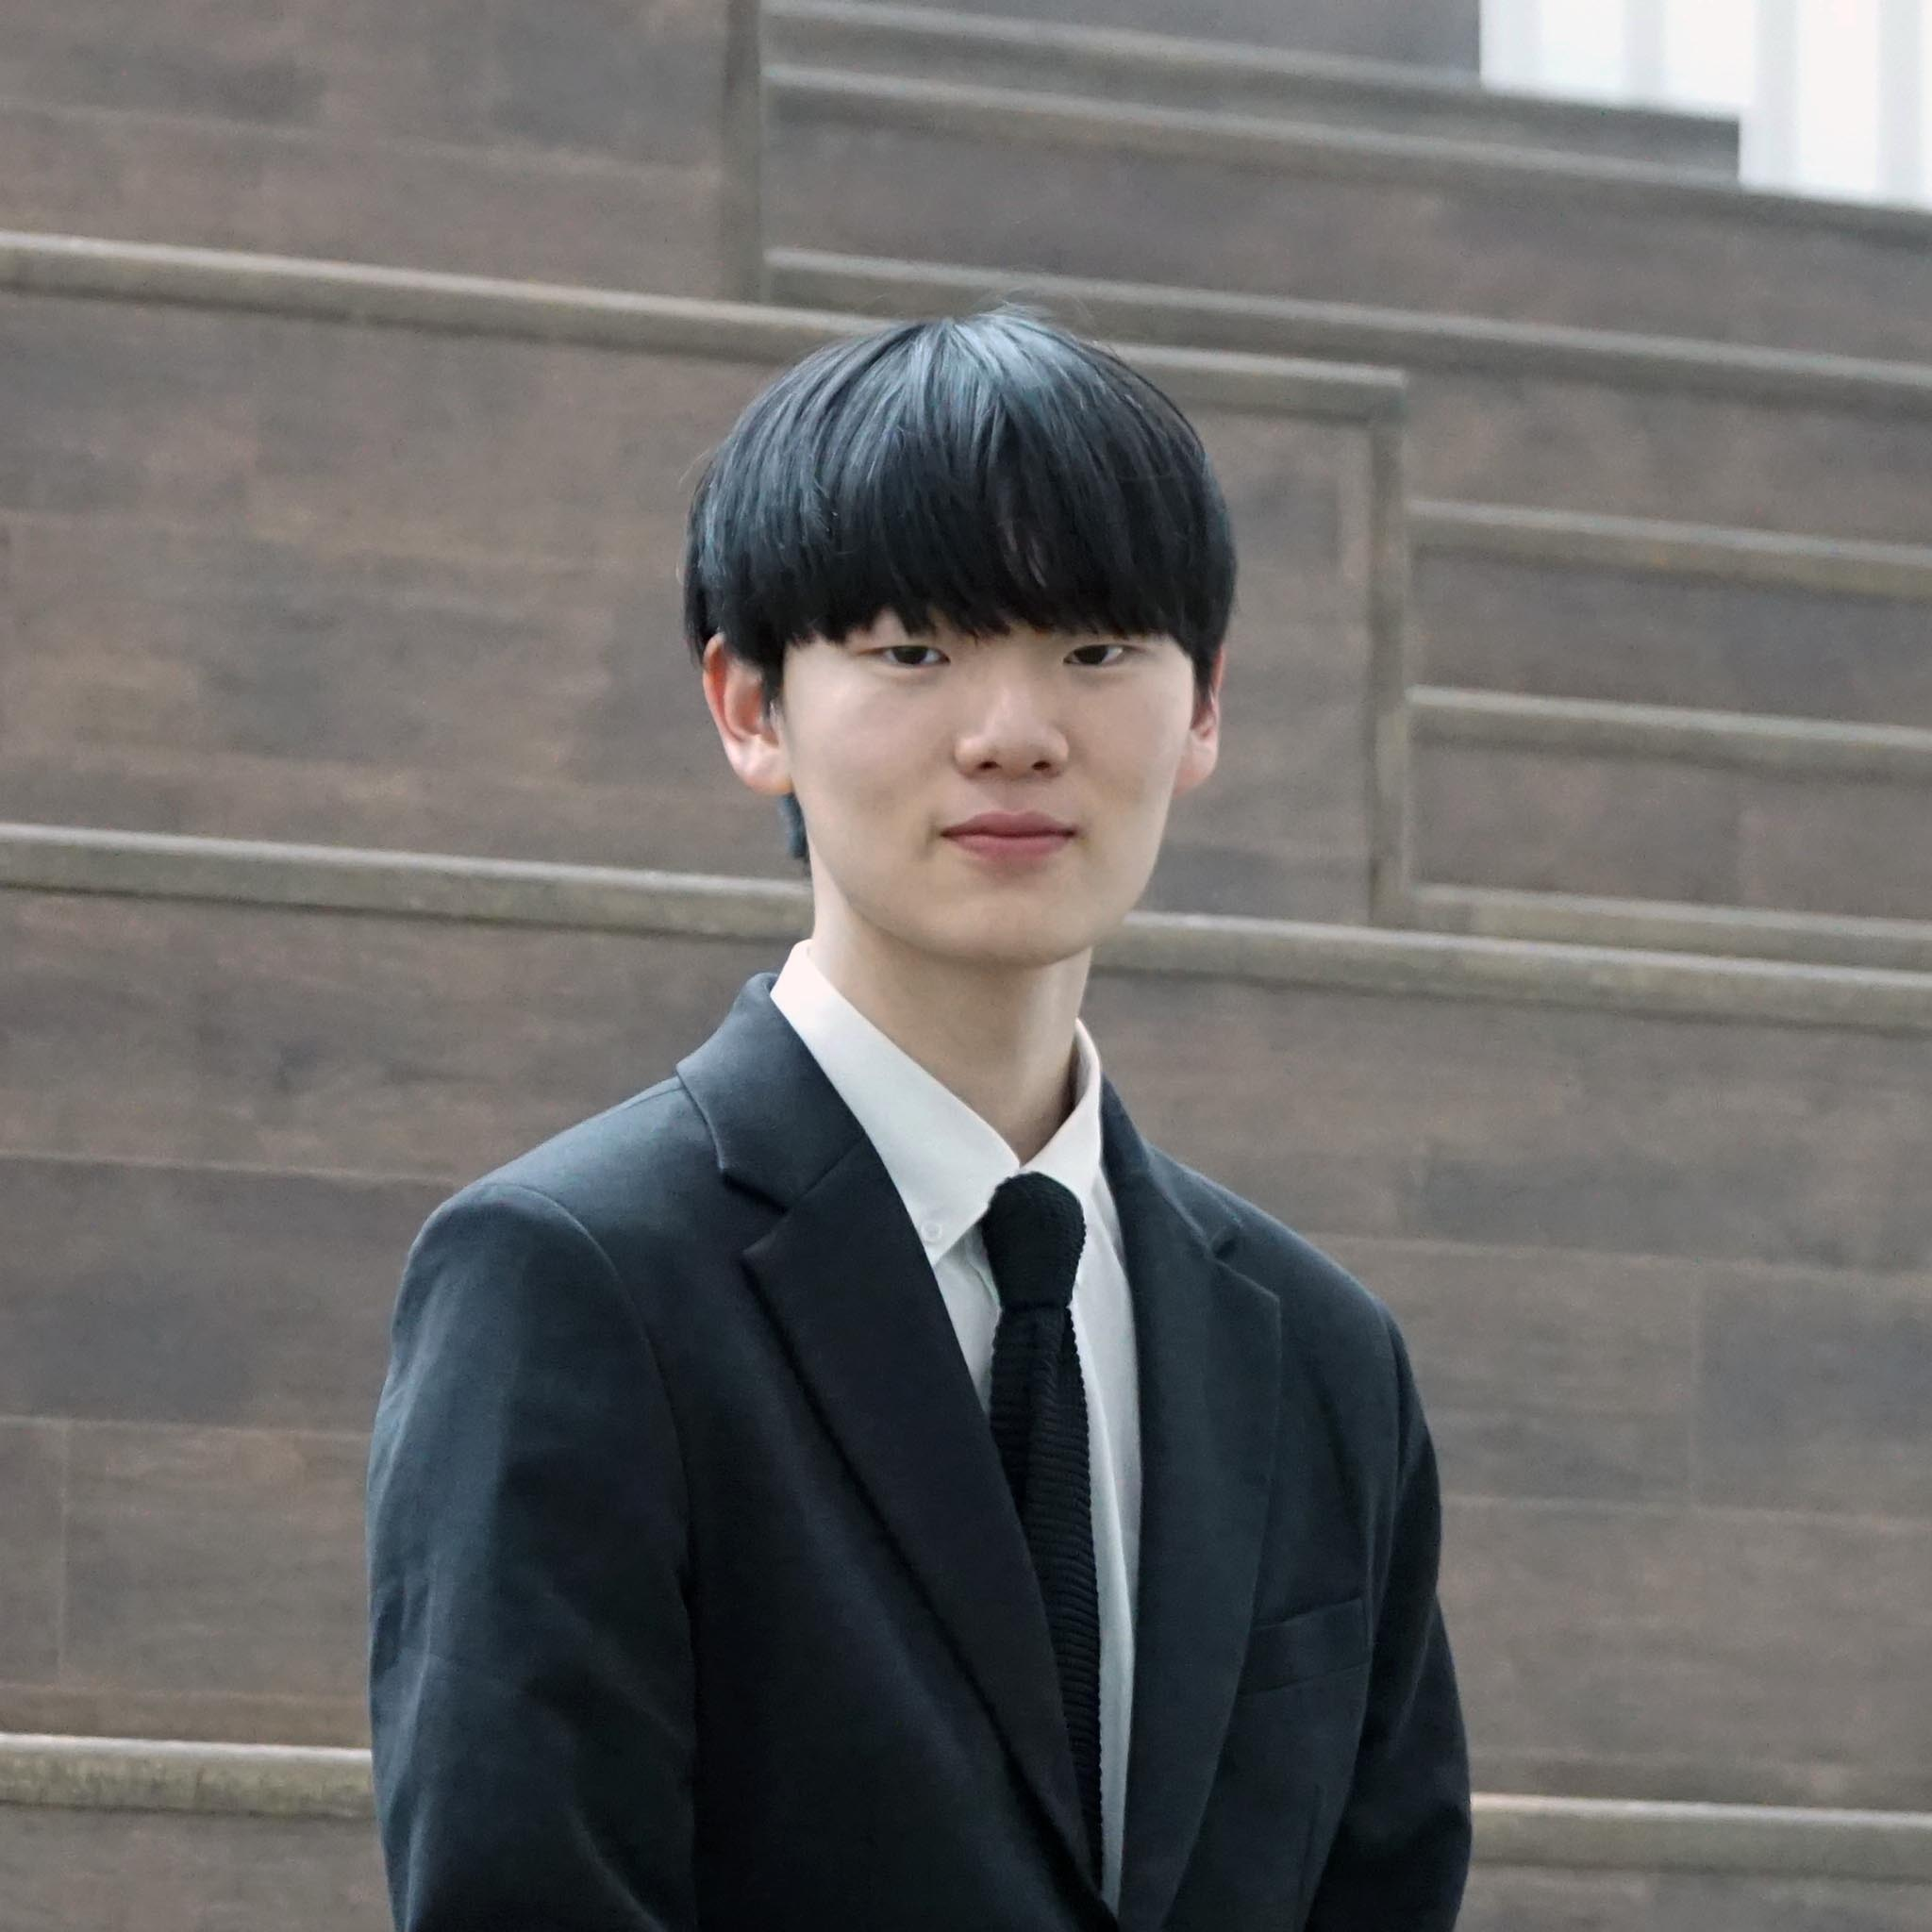 Head: M.S. Gwon